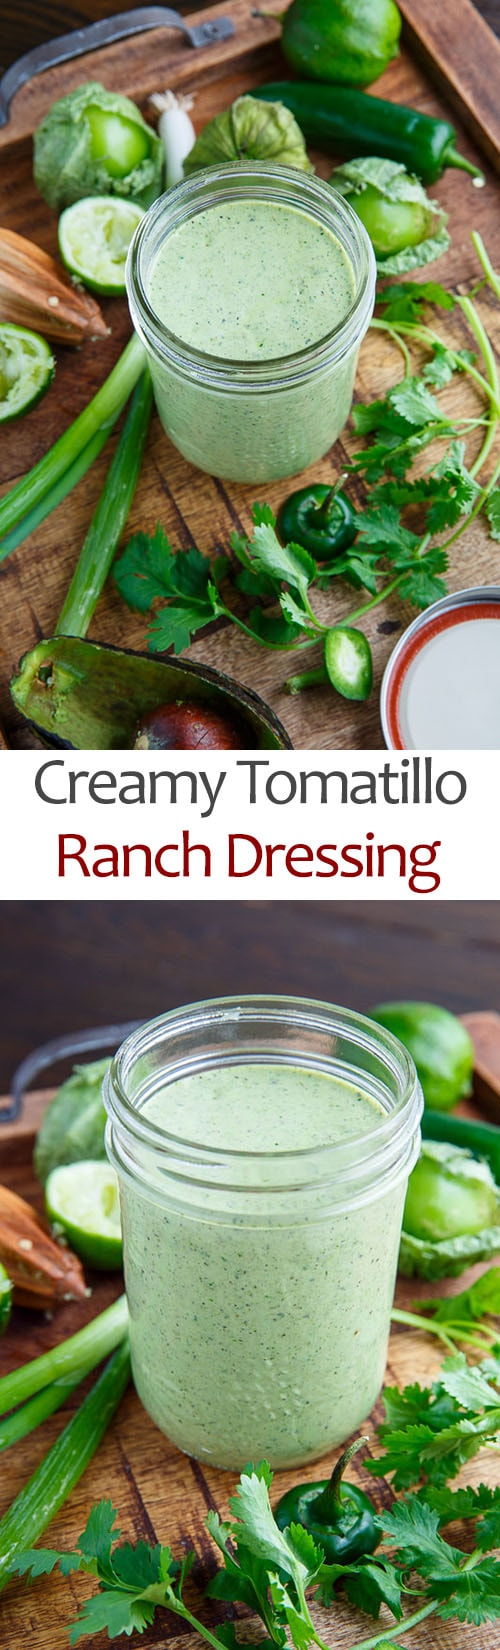 Creamy Tomatillo Ranch Dressing